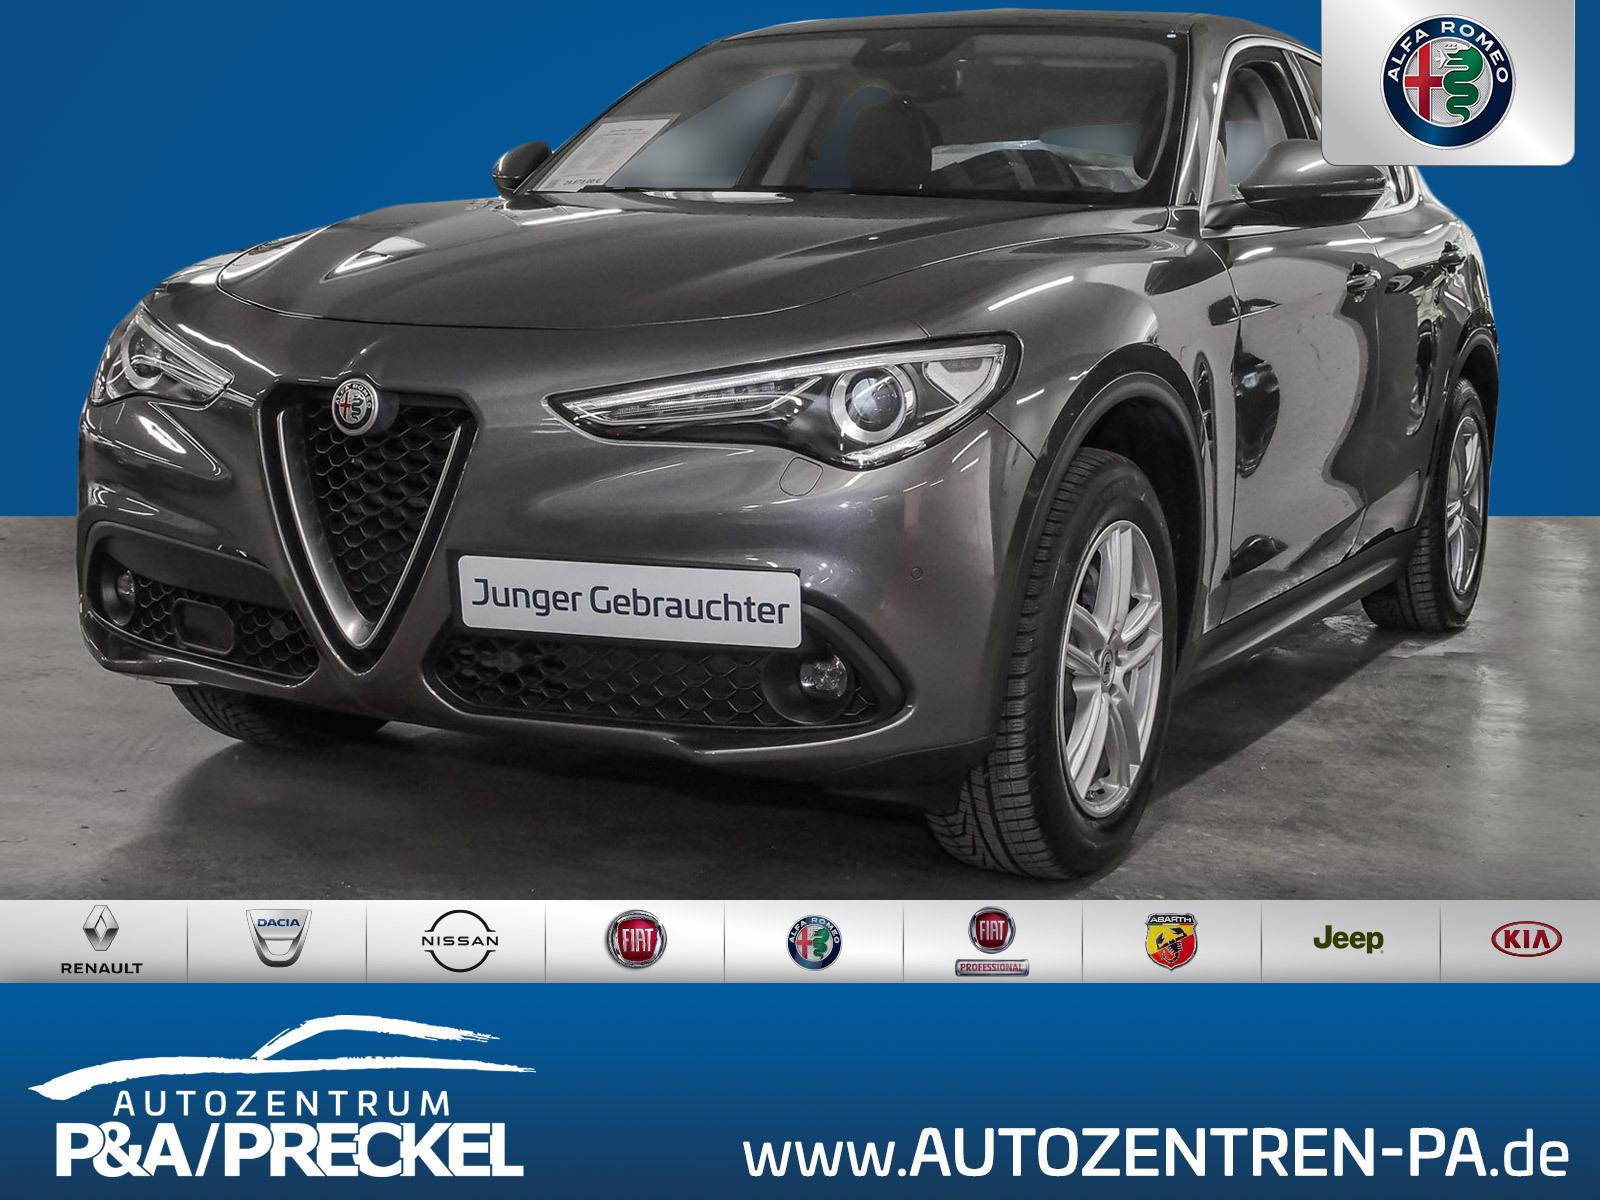 Alfa Romeo Stelvio Super 2.2 Diesel /Navi/Xenon/Kamera/SHZ, Jahr 2017, Diesel